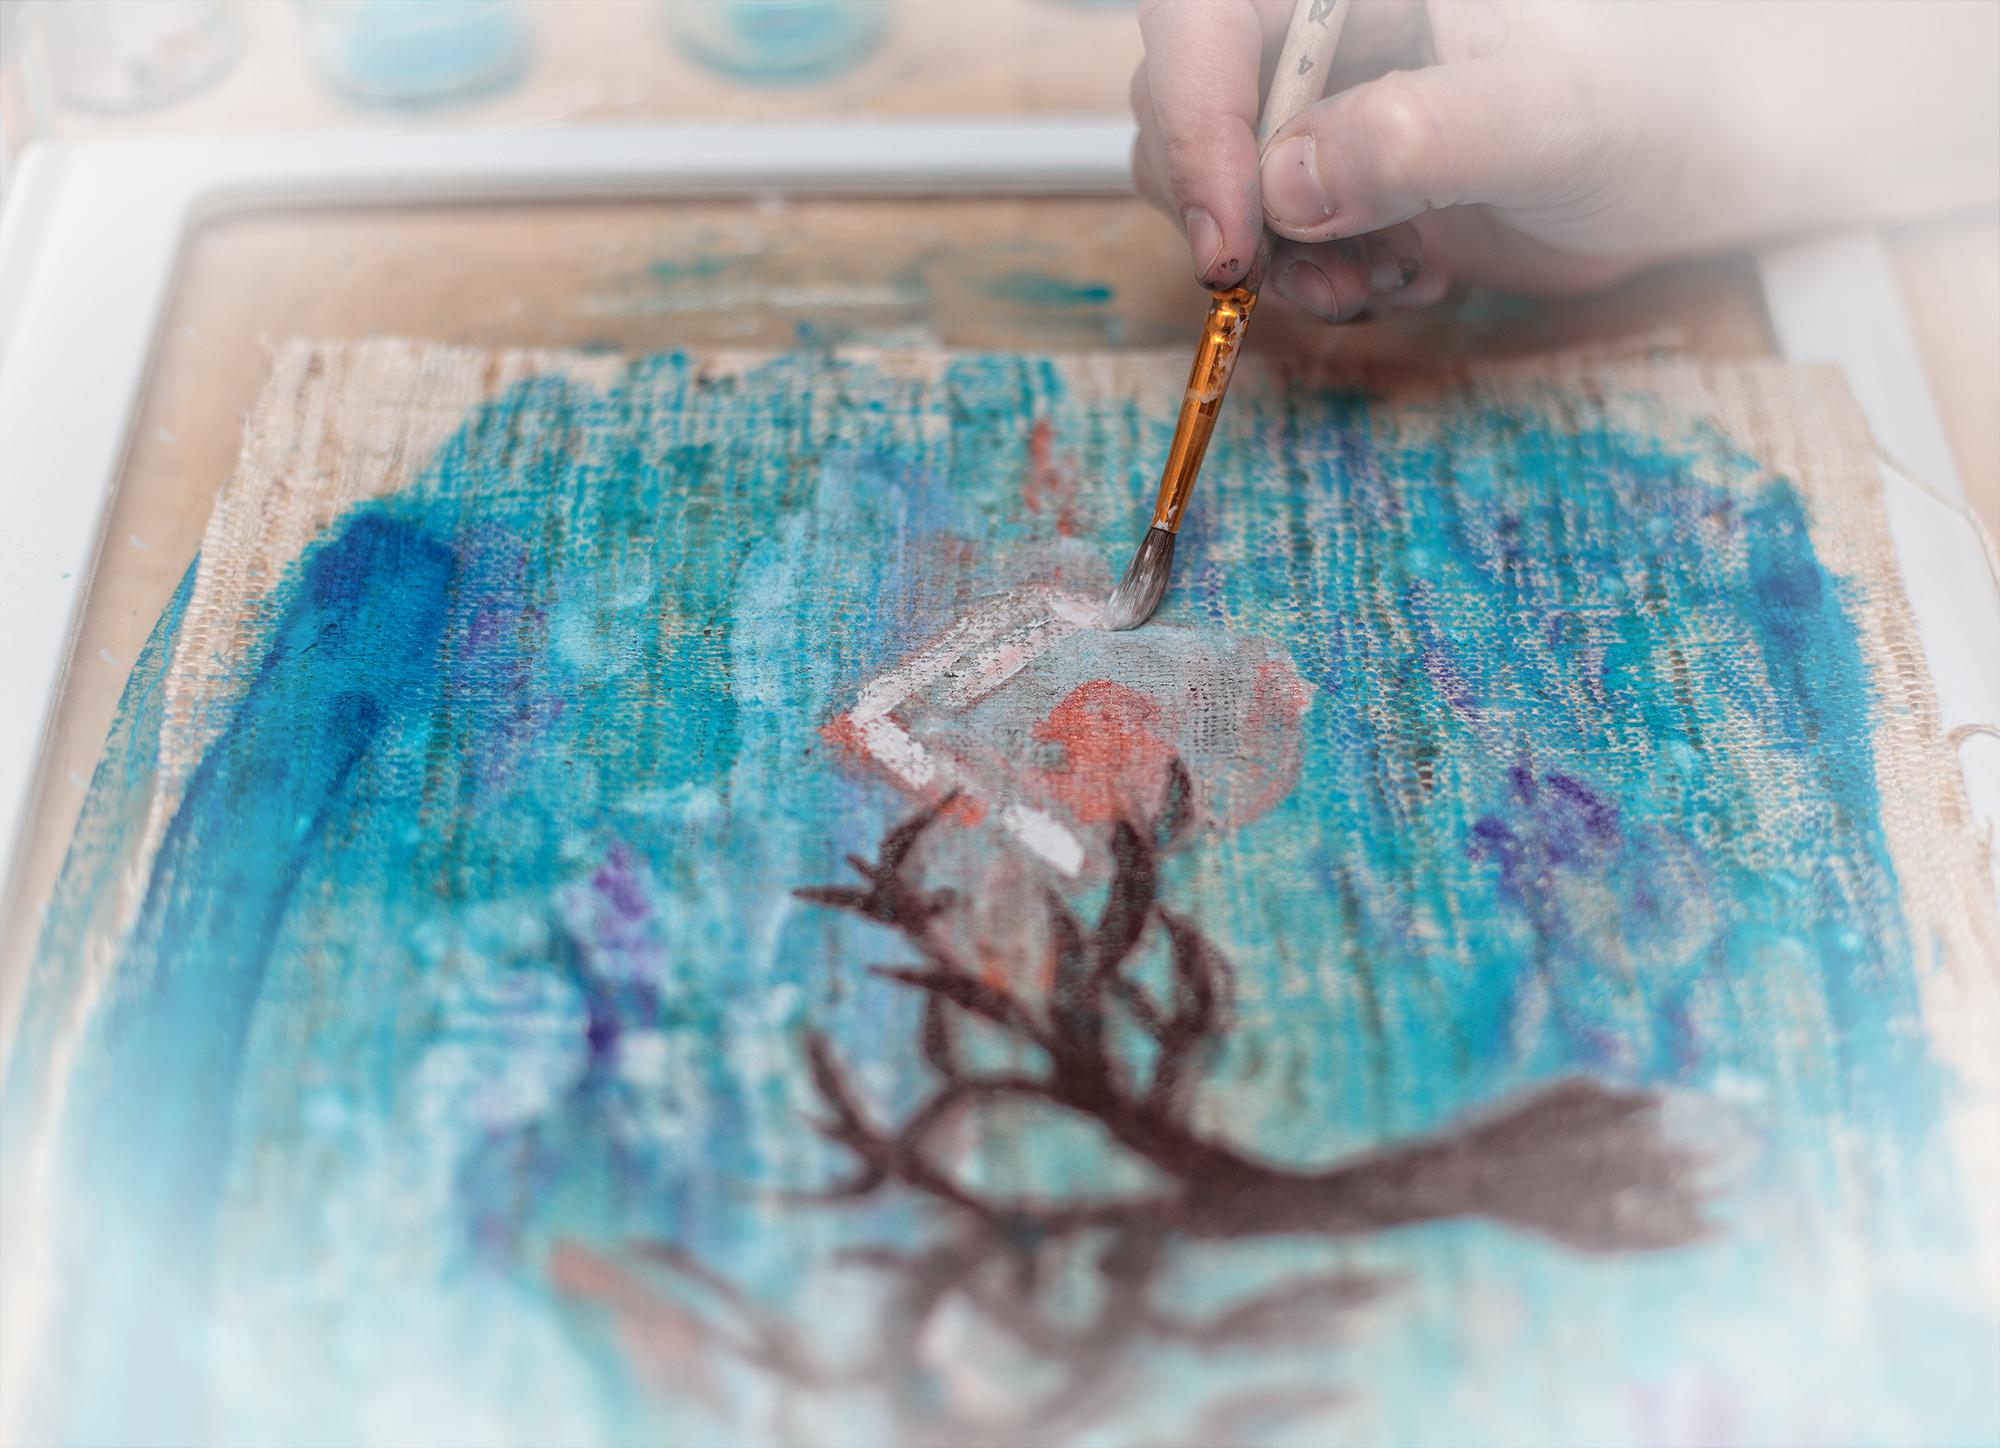 monotype, lesson, Master Class, silk, paint, workshop, hand print, монотипия, мастер-класс, семинар, урок, ручная печать, ткань, принт, шелк, рабочий процесс, work process, artist hands, руки художника